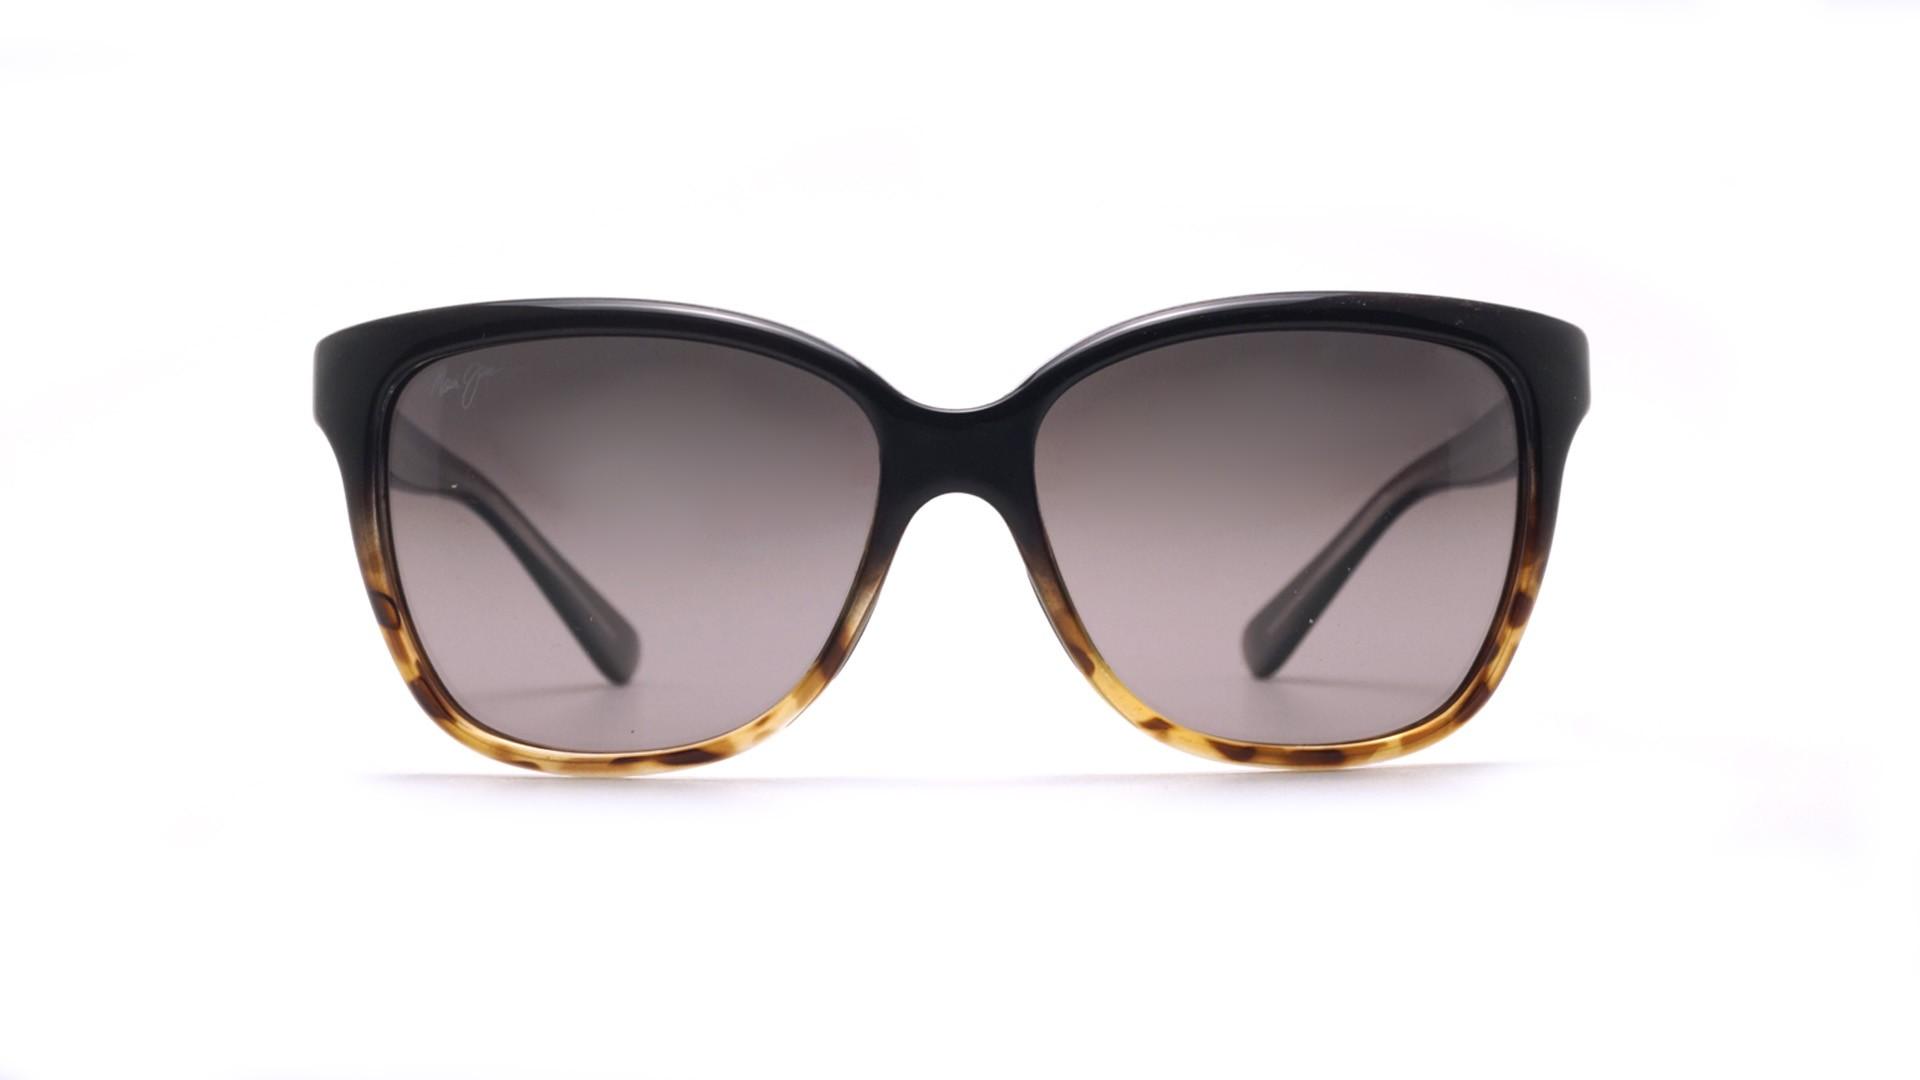 c4582a4eb15 Sunglasses Maui Jim Starfish Black Neutral Grey GS744 02T 56-15 Medium  Polarized Gradient